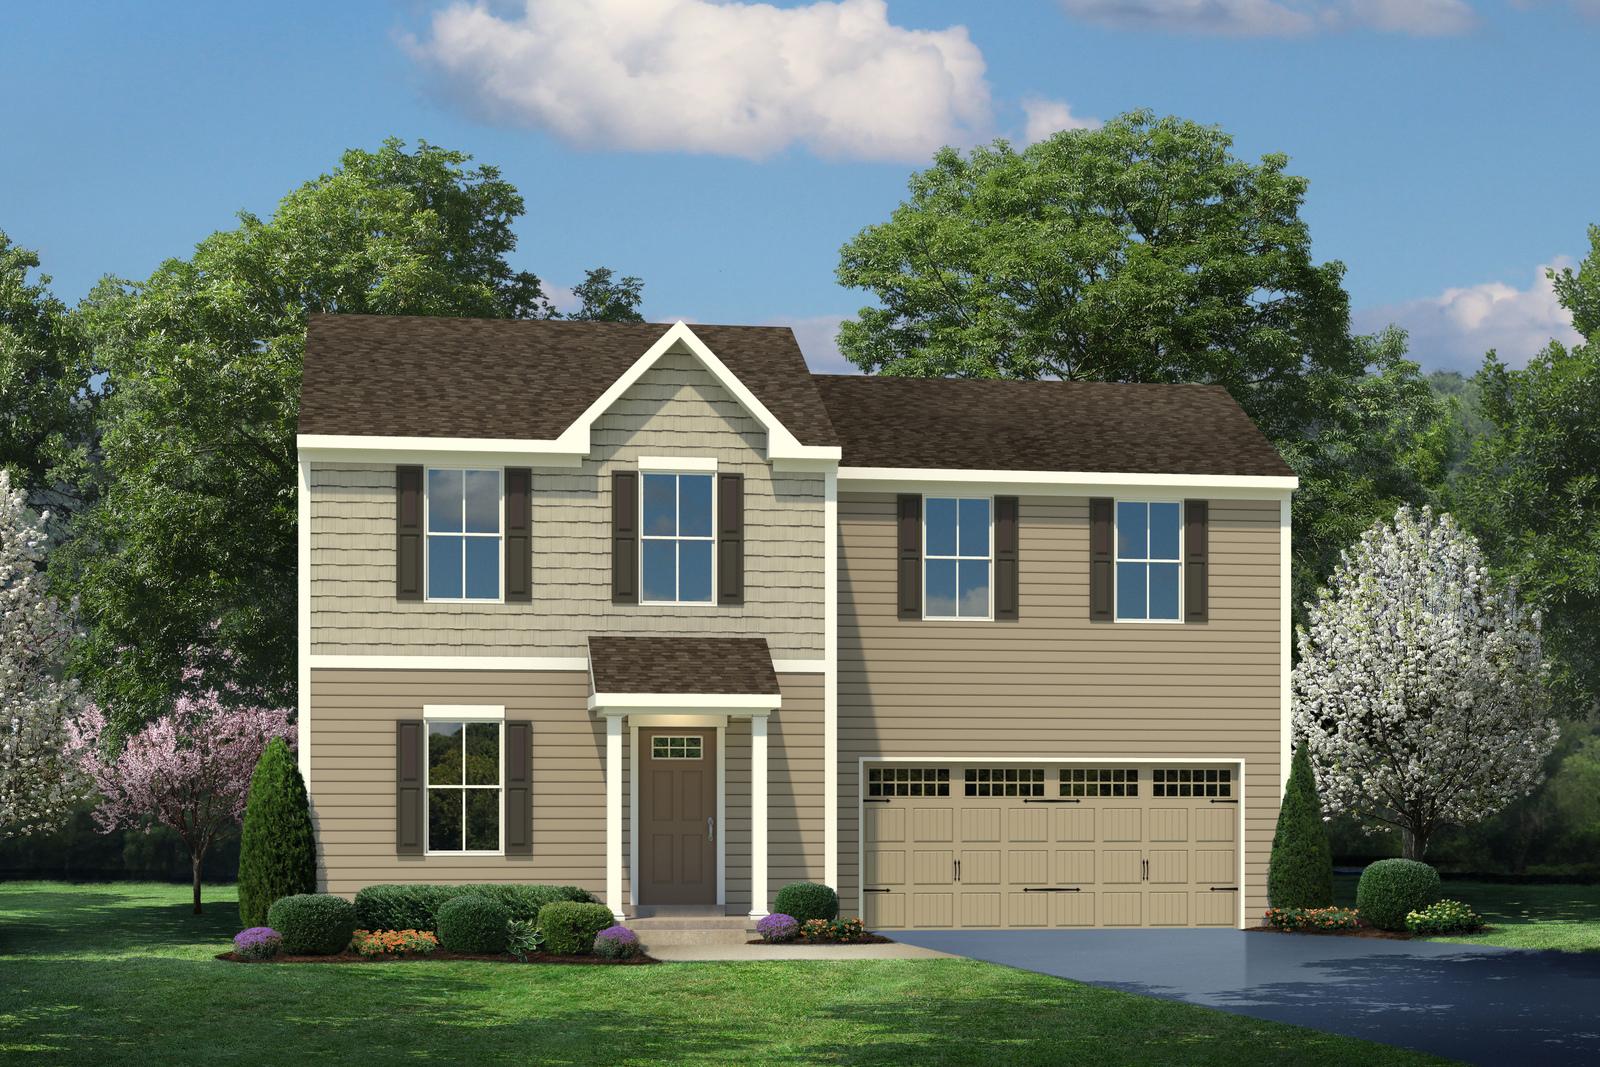 Plan 1440 at Oakwood Hills